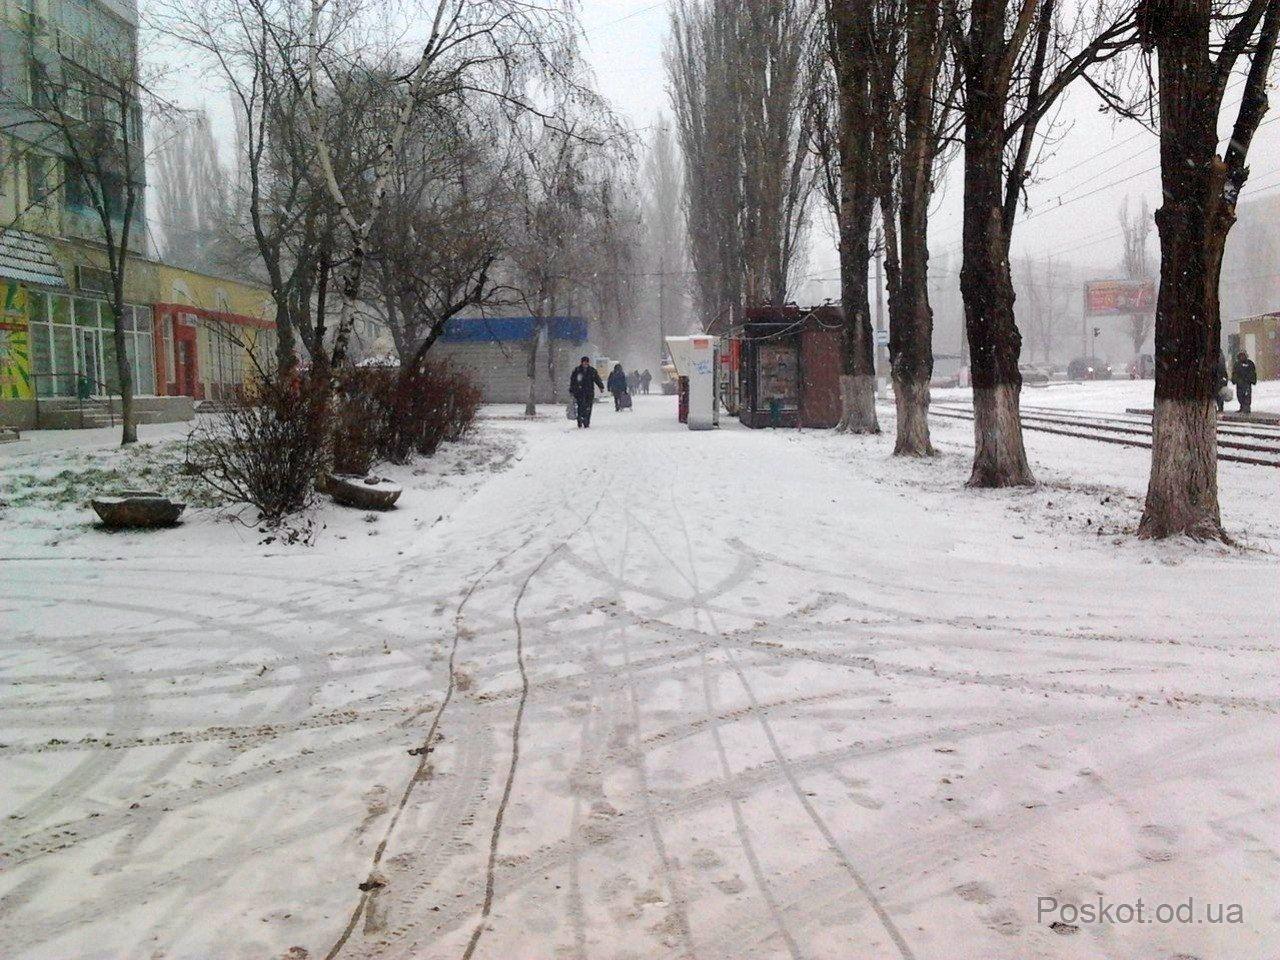 Зима, Поскот